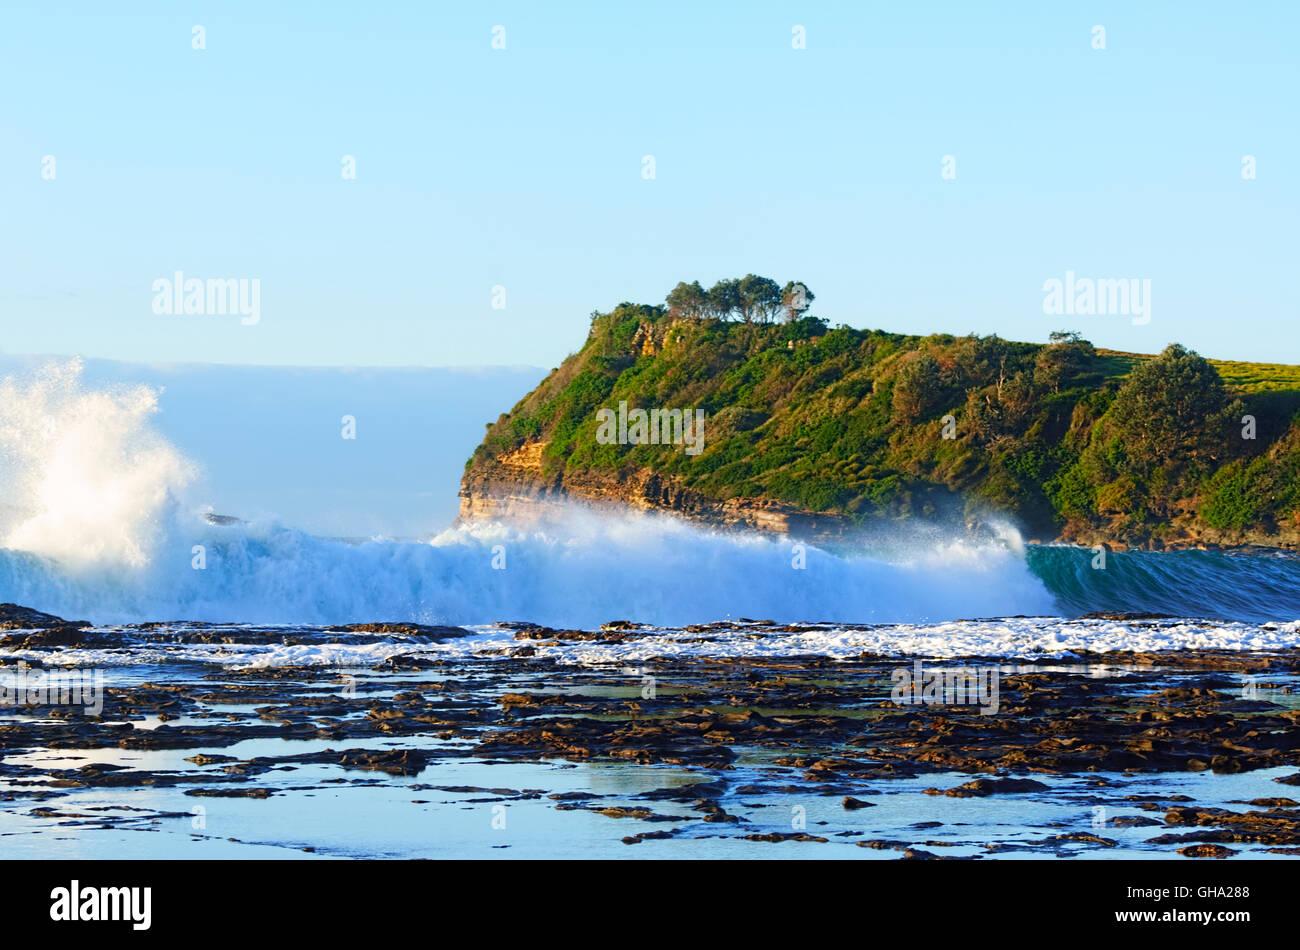 Mari pesante al Boat Harbour, Gerringong, Illawarra Costa, Nuovo Galles del Sud, NSW, Australia Immagini Stock